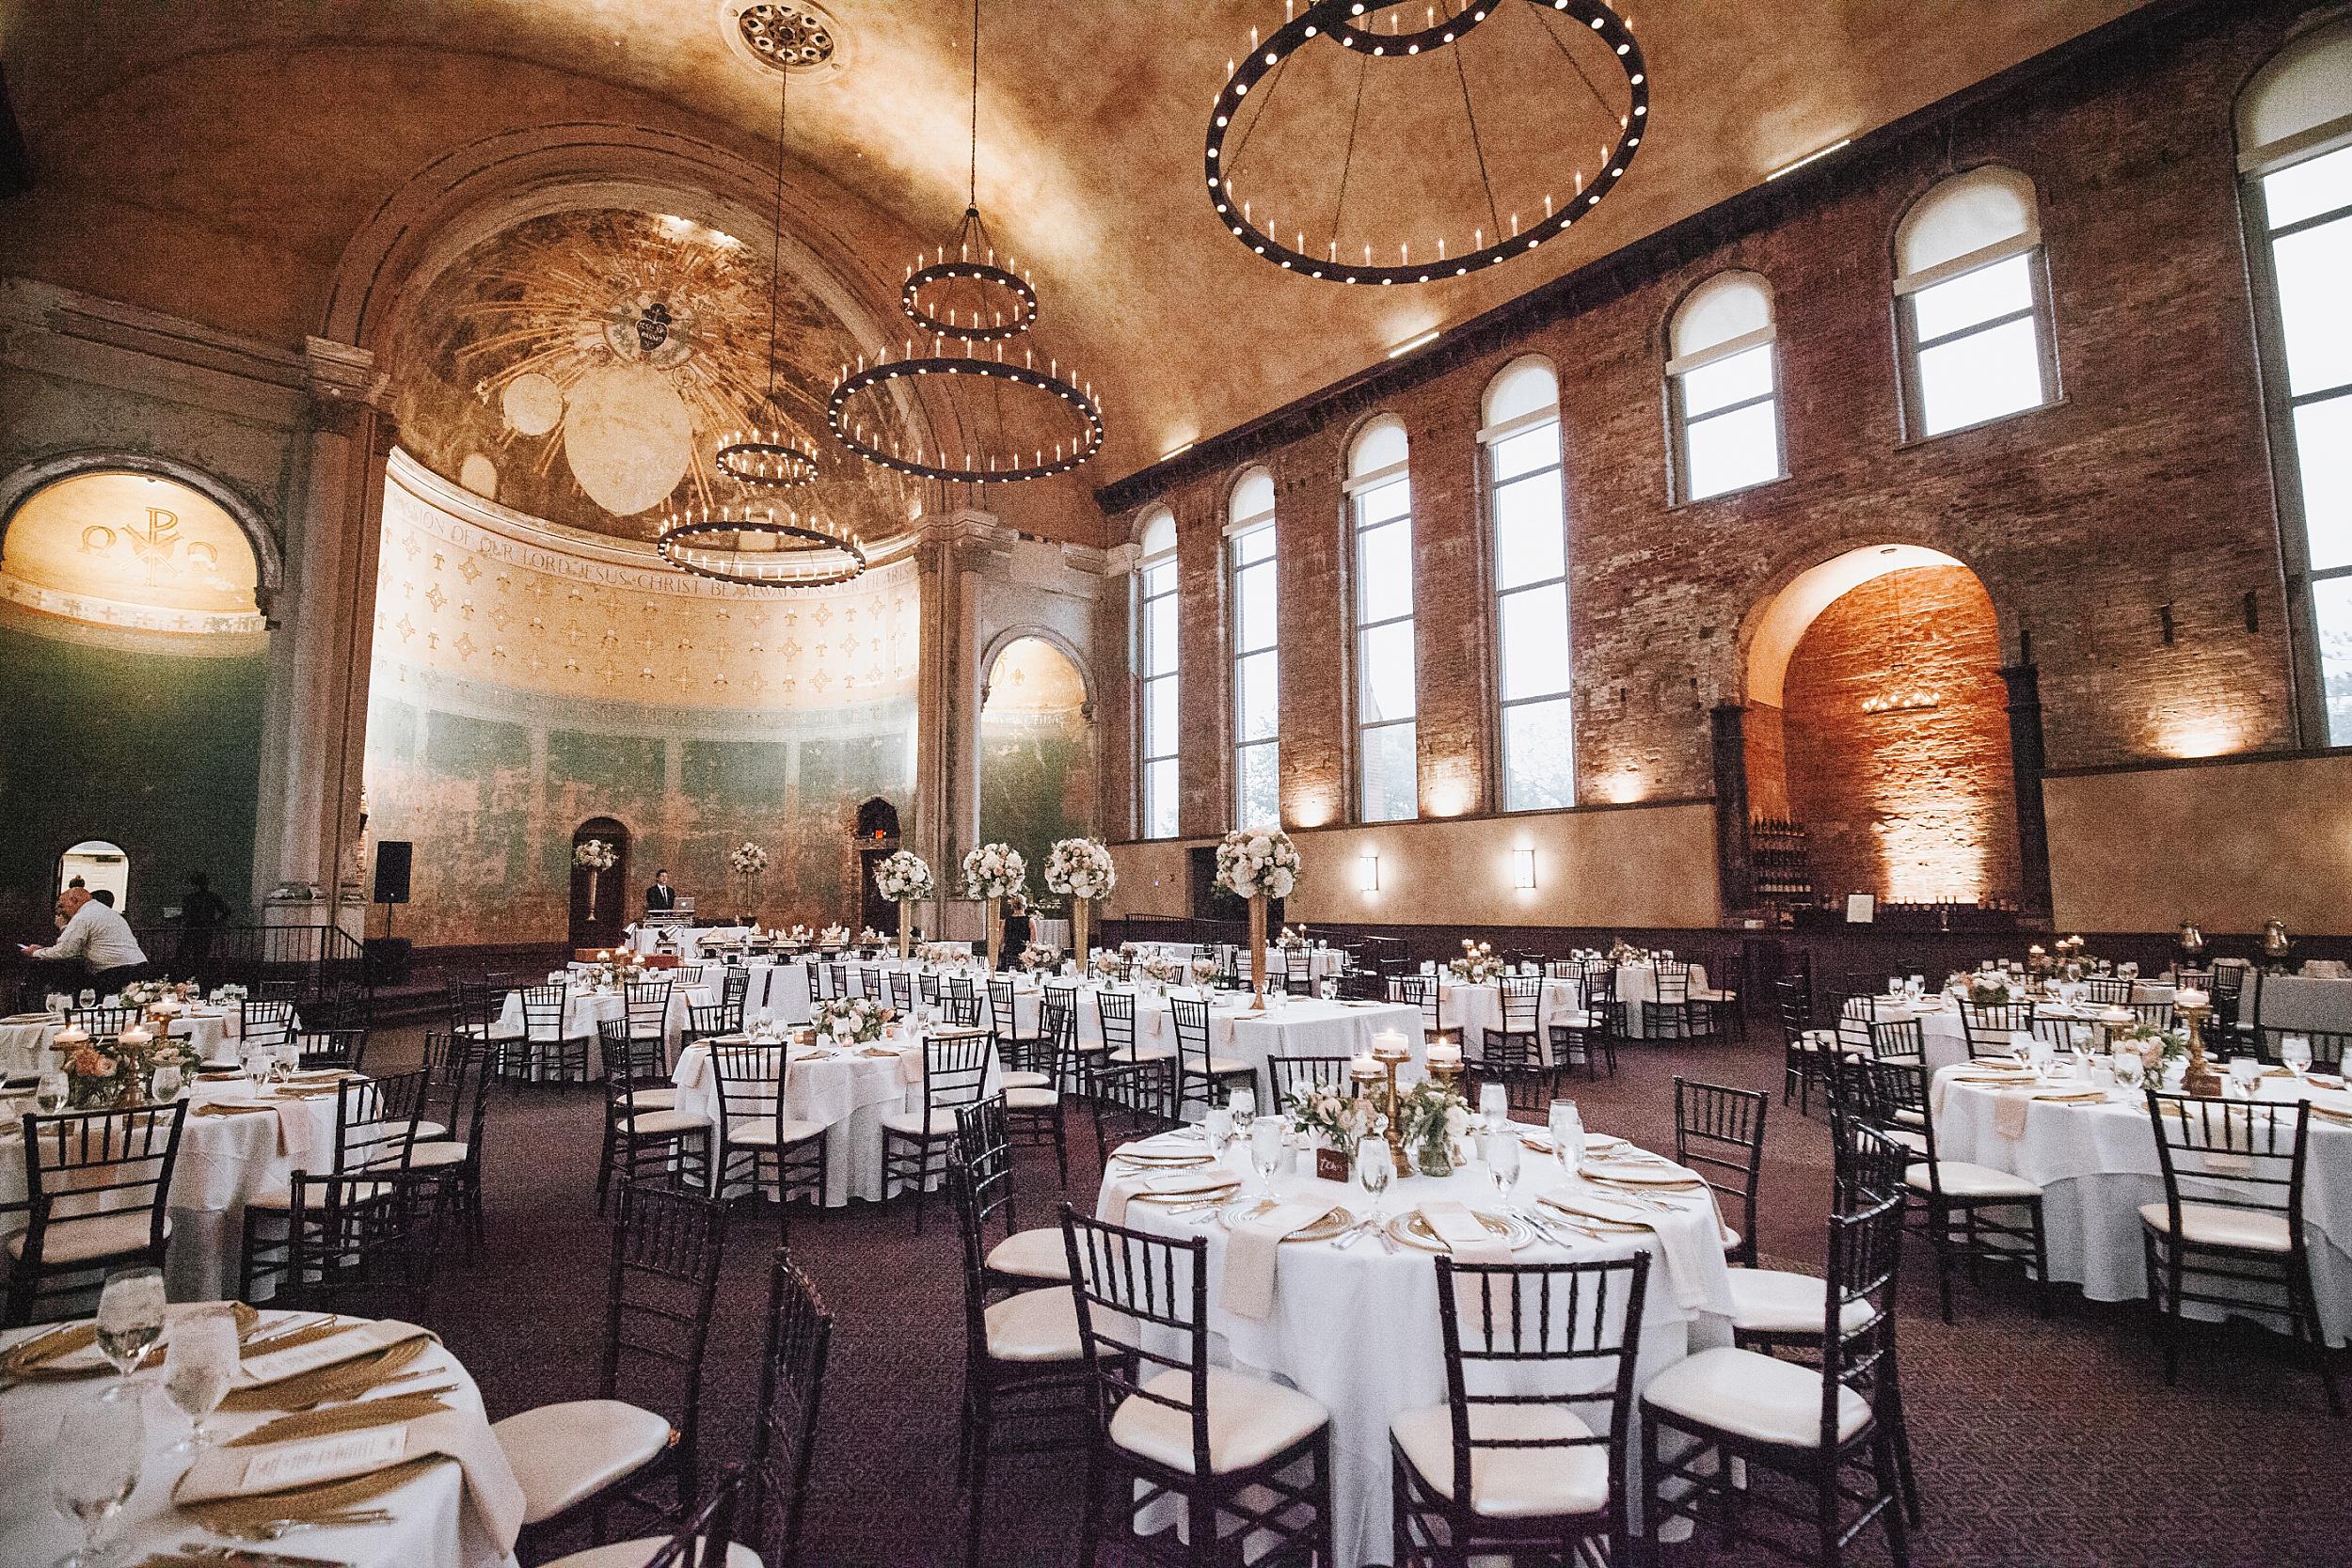 Brooke Townsend Photography - Cincinnati Wedding Photographer (147 of 170).jpg